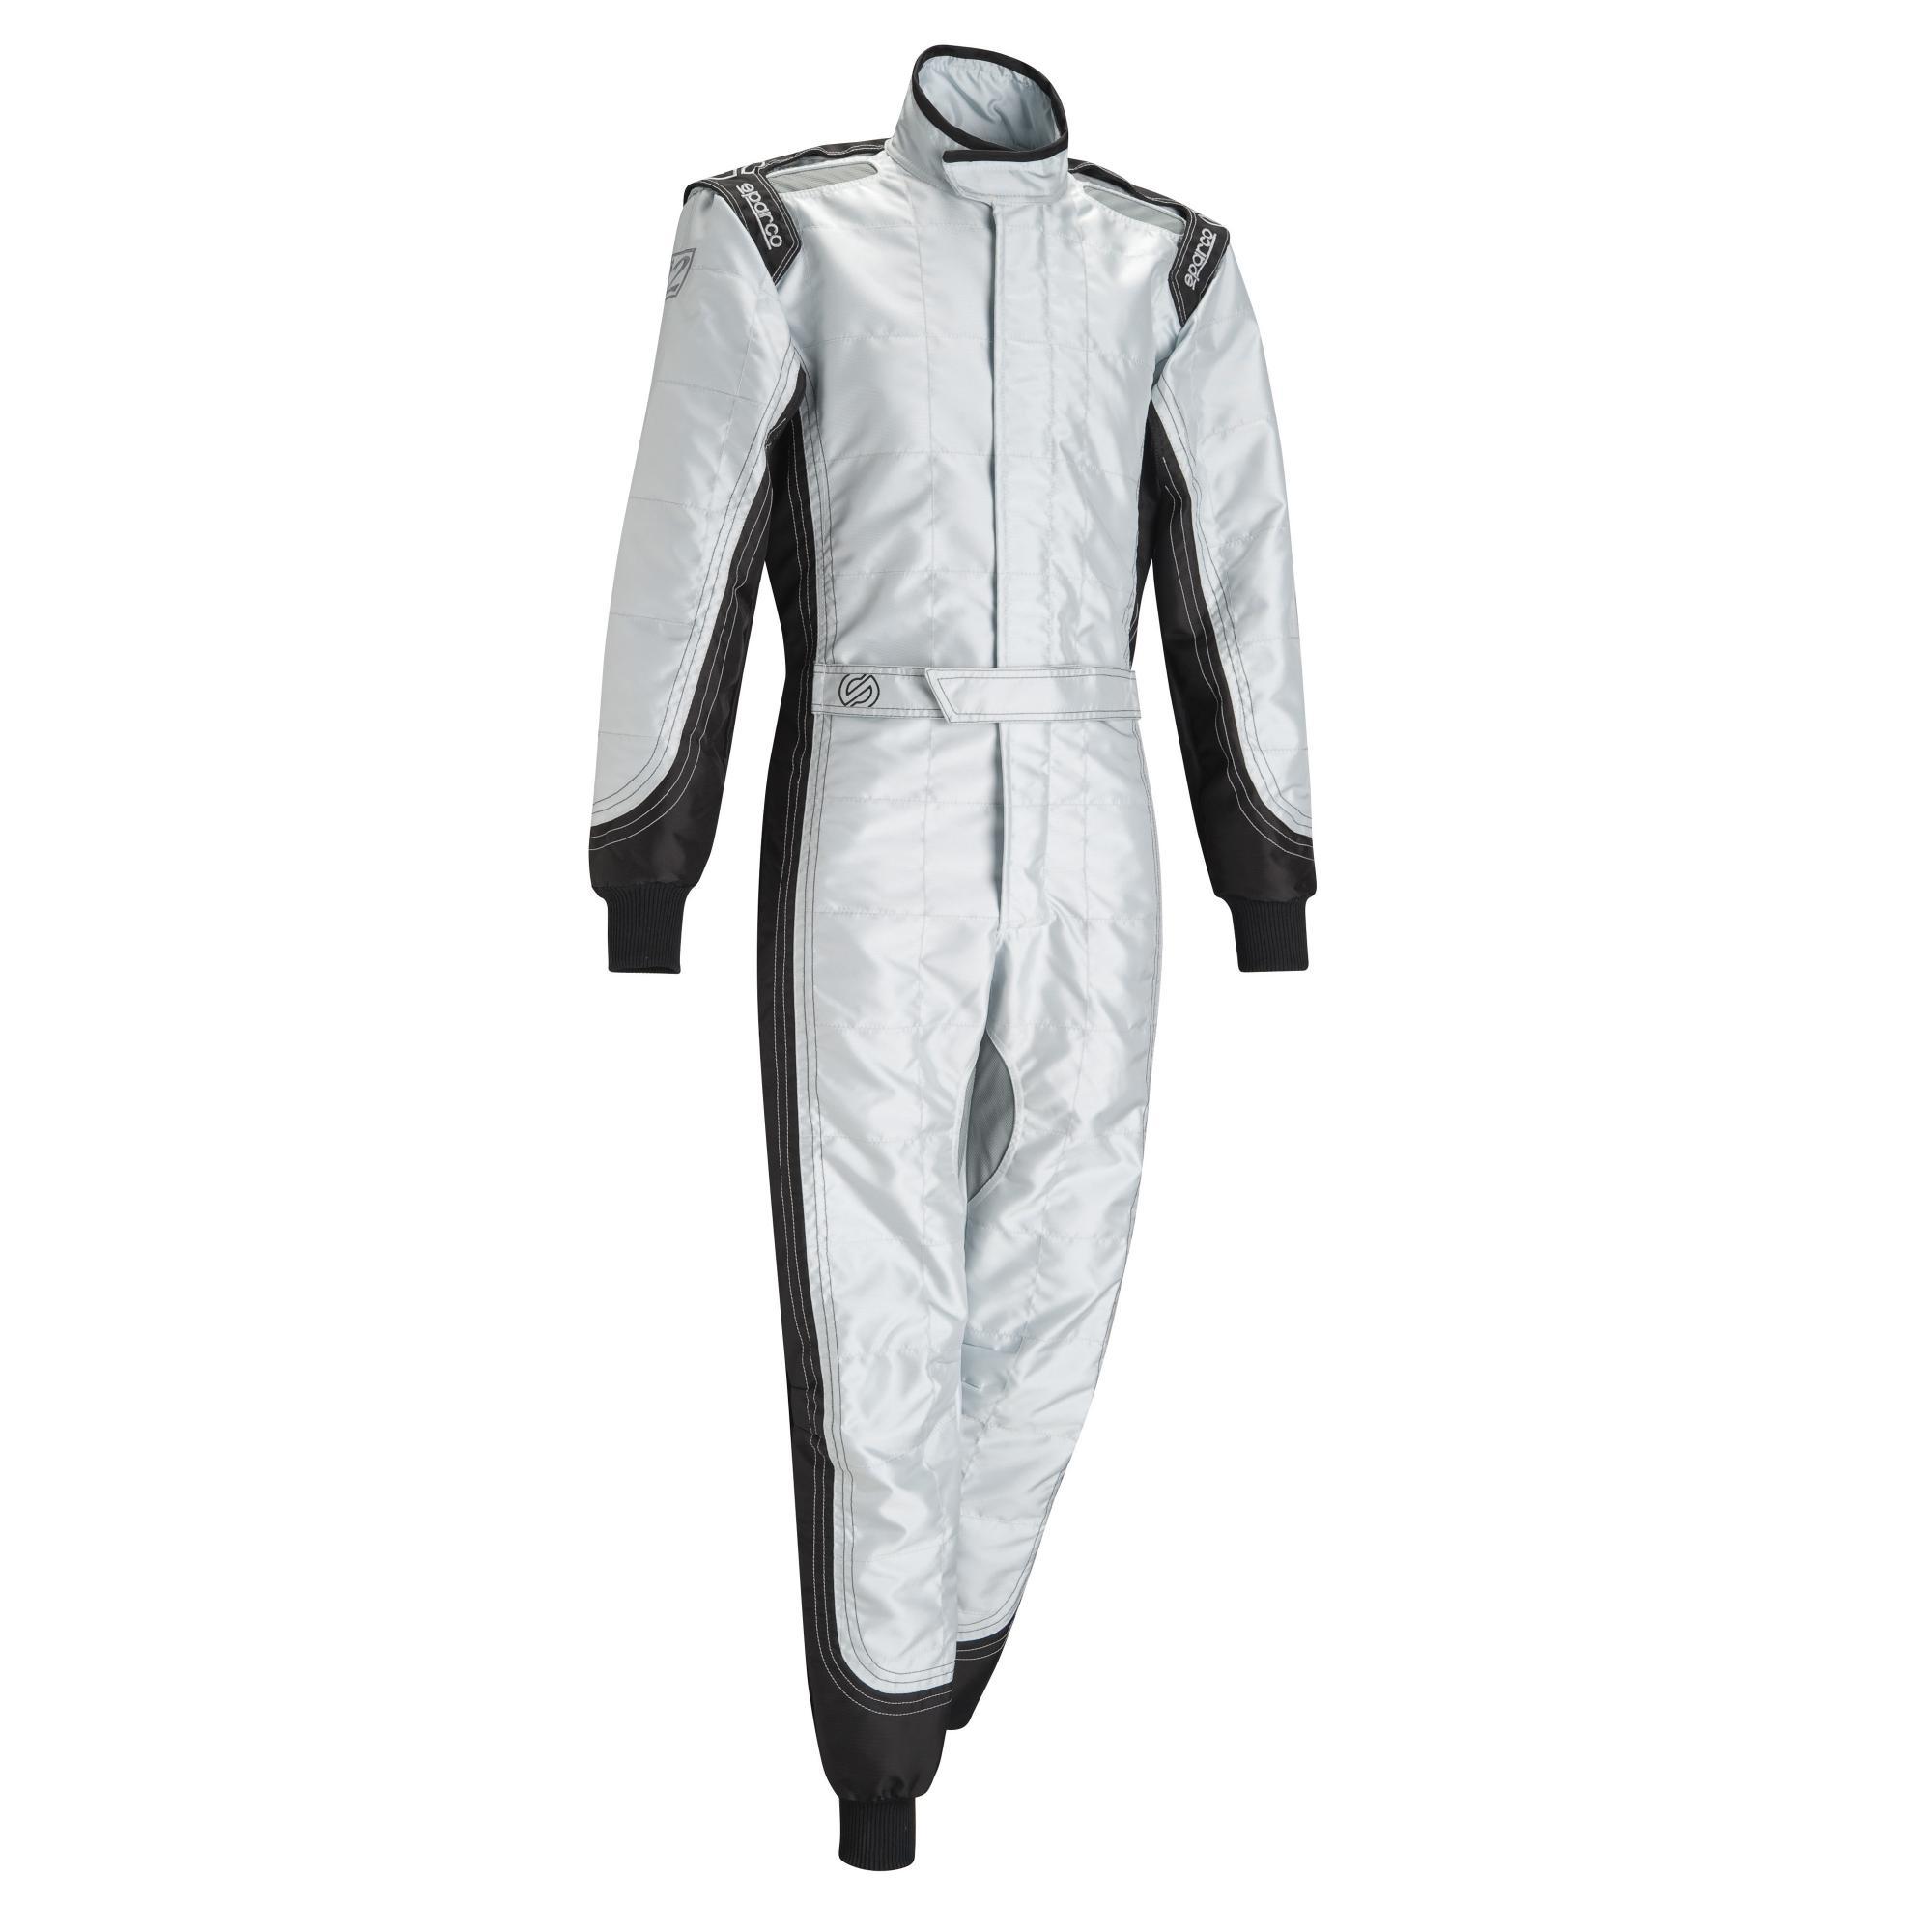 Sparco Racing Suits Sparco Profi Kx-3 Kart Racing